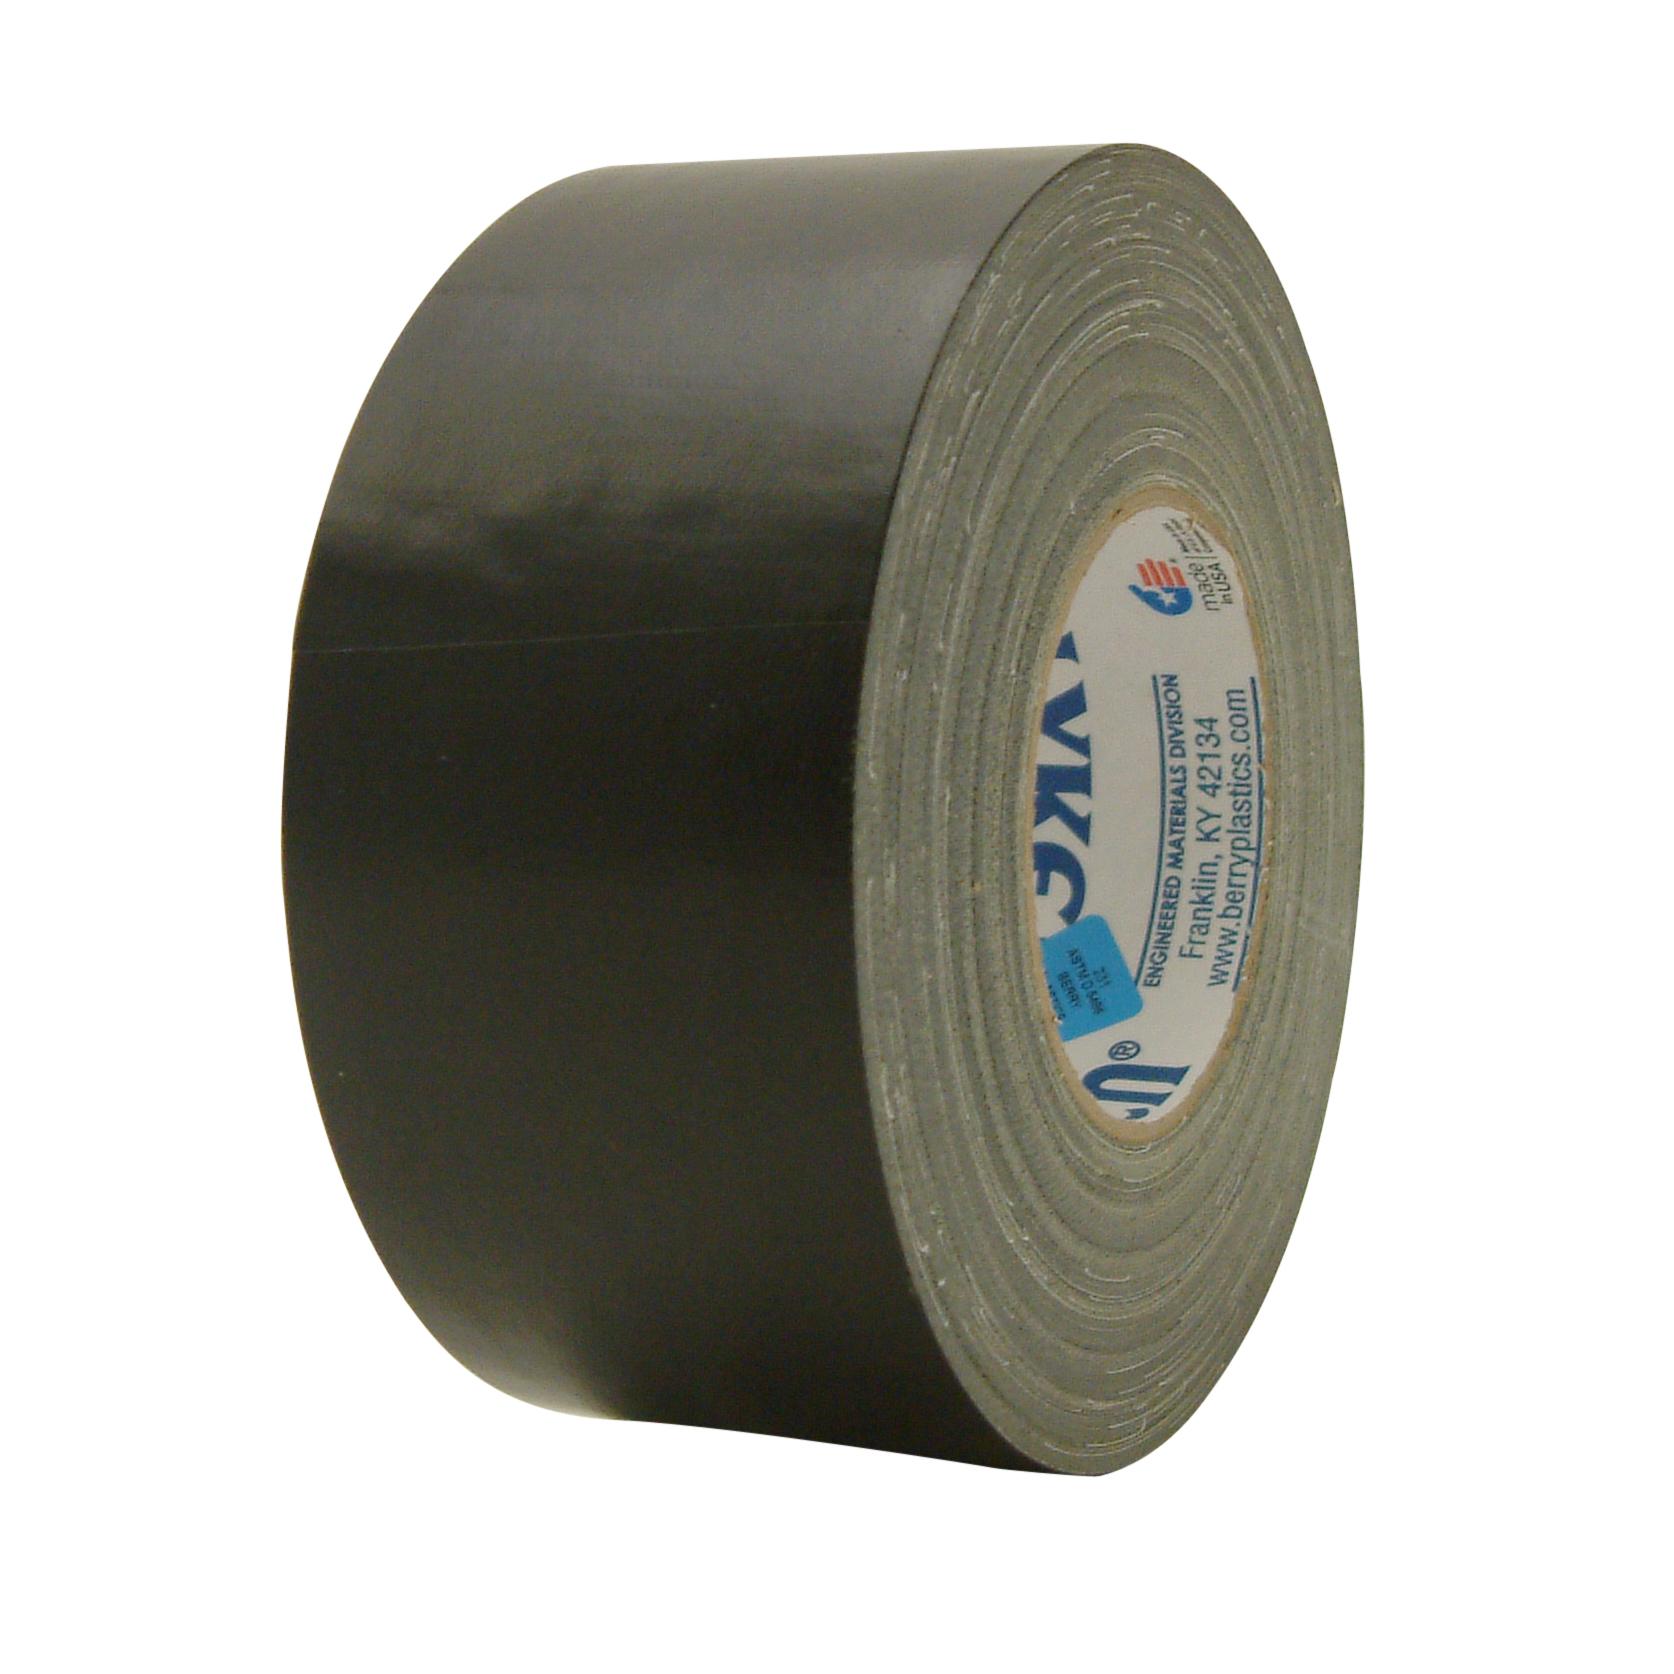 Polyken 231 Military Grade Duct Tape: 3 in. x 60 yds. (Black) *branded